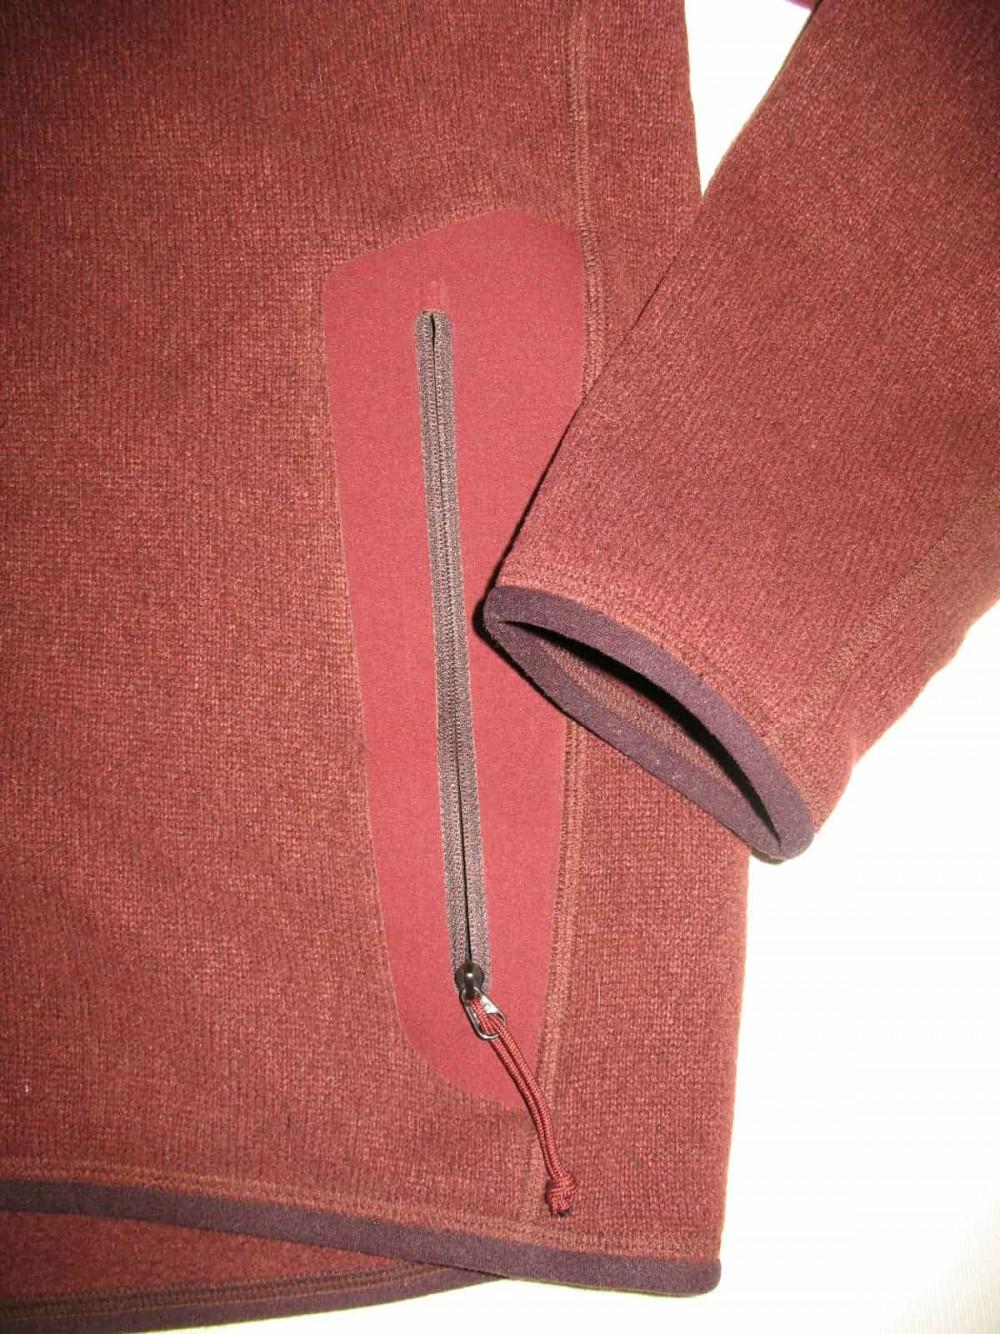 Кофта ARC'TERYX covert hoody (размер M) - 5